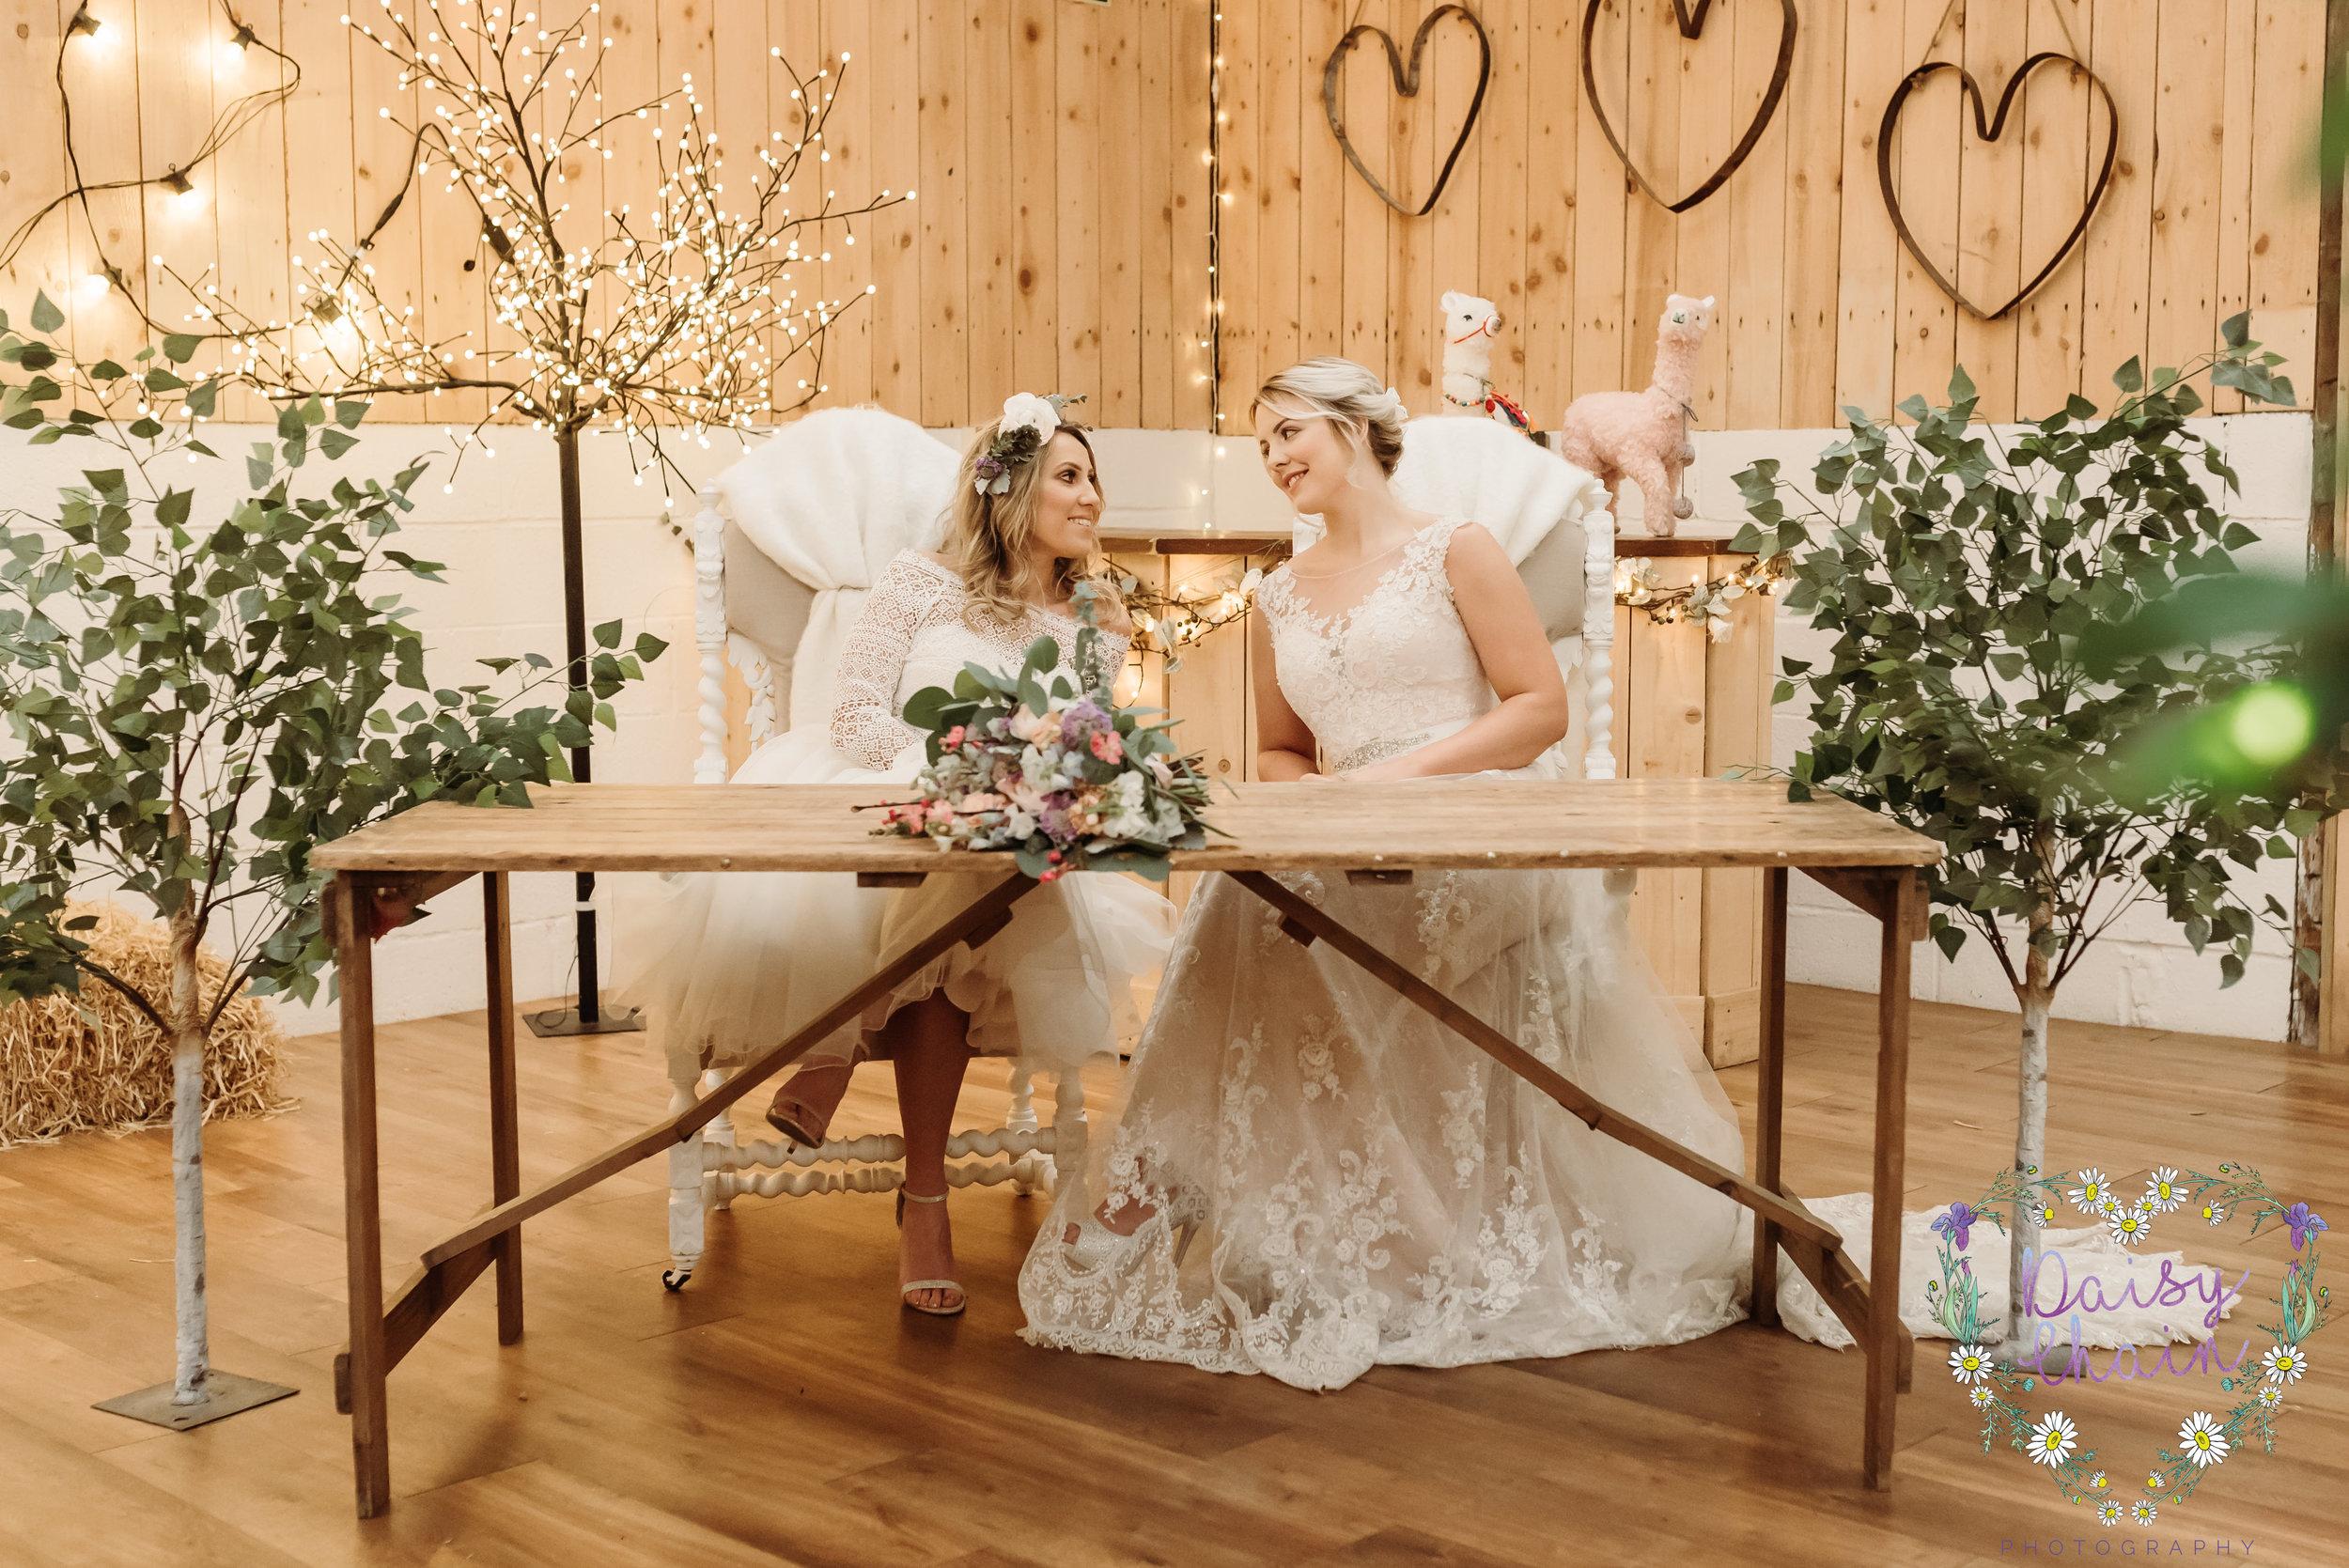 two brides - same sex wedding